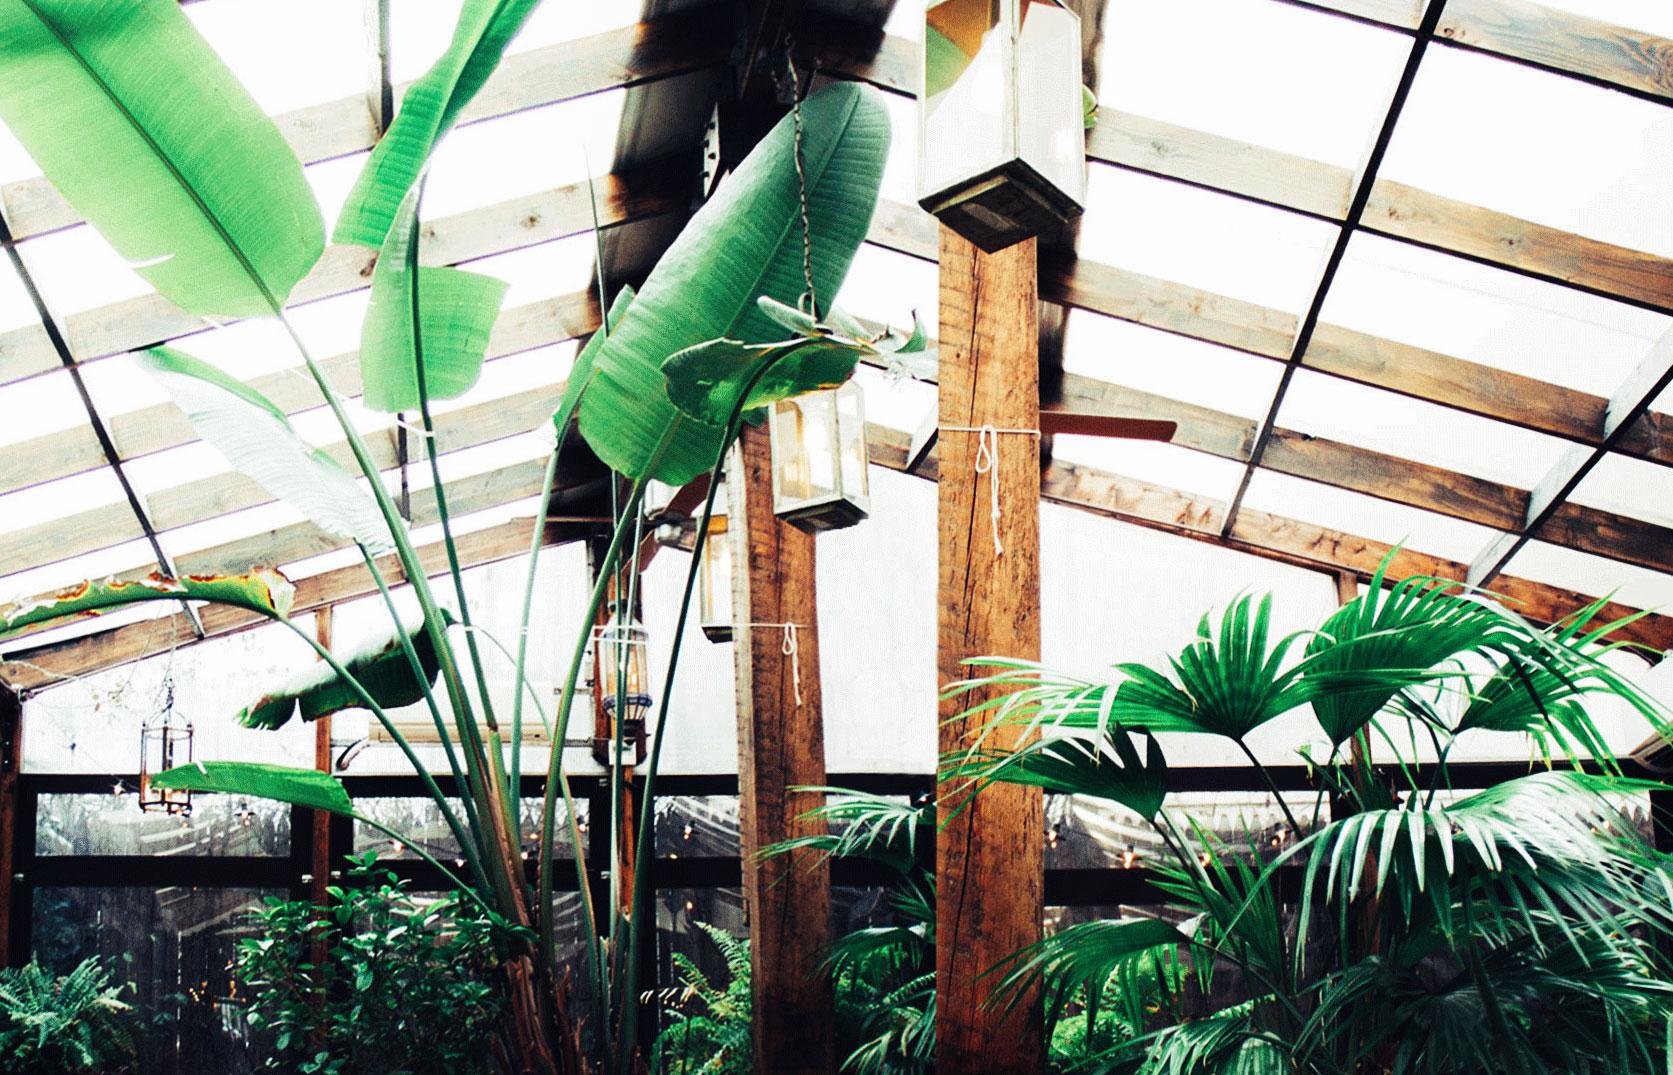 Brooklyn Mogador's garden with tropical plants